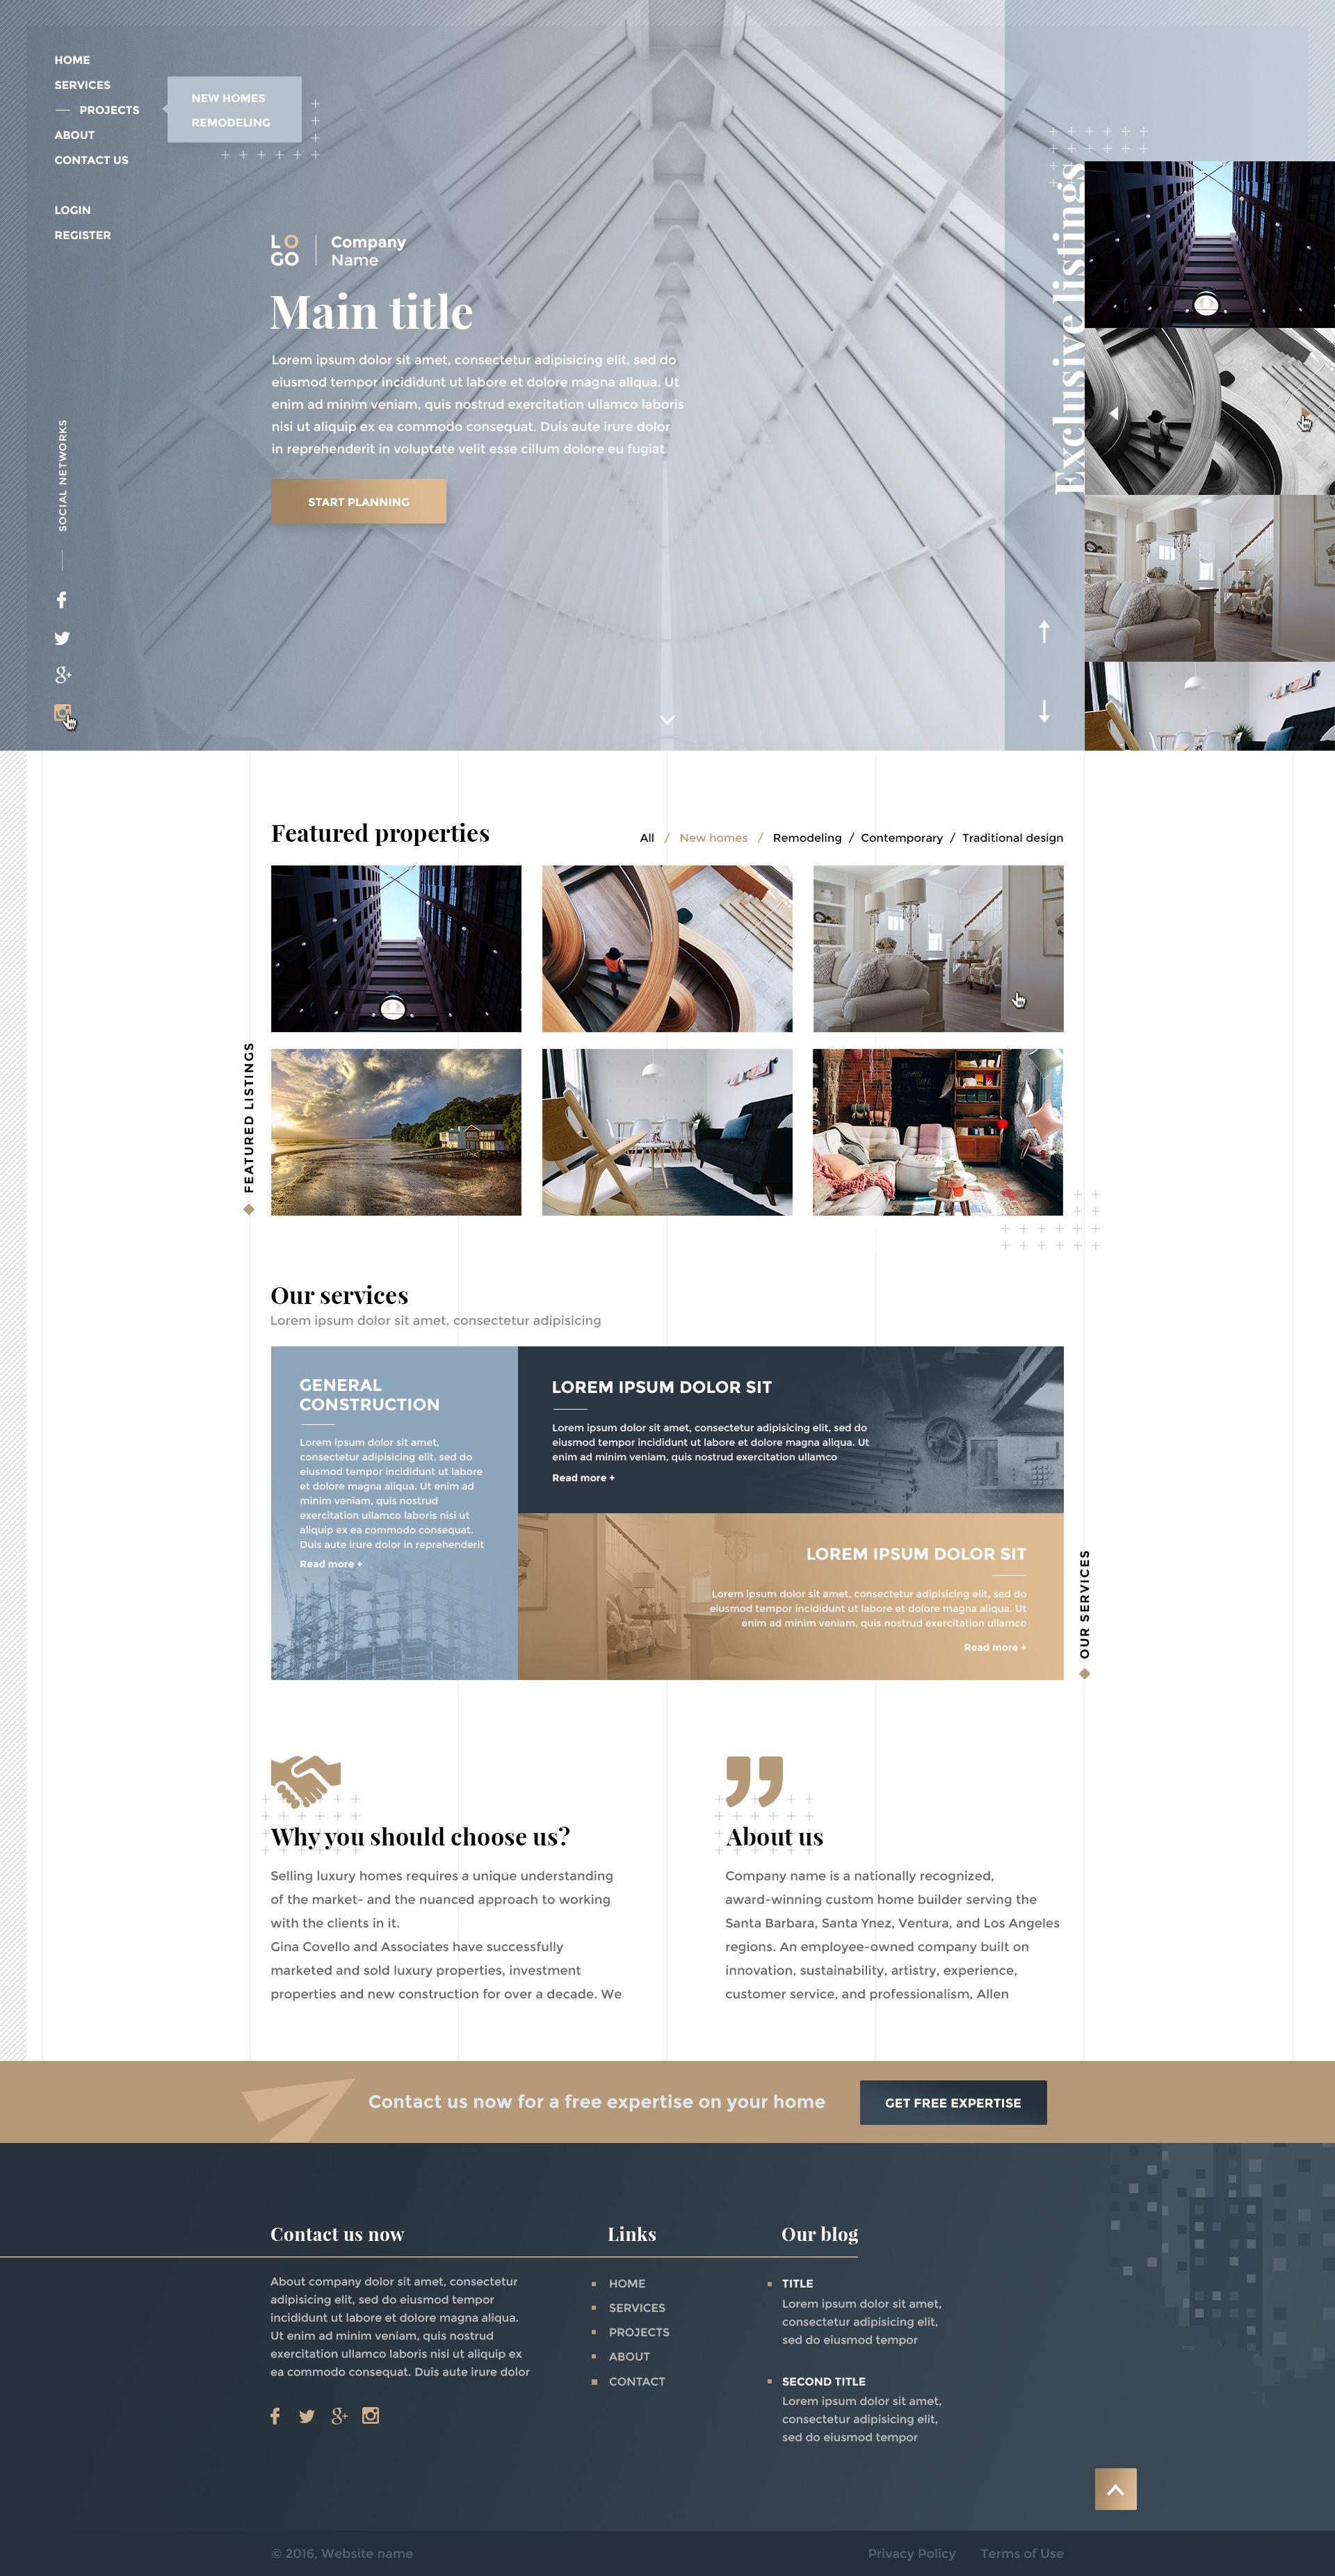 Construction And Interrior Design V2 2 Interrior Design Design Web Design